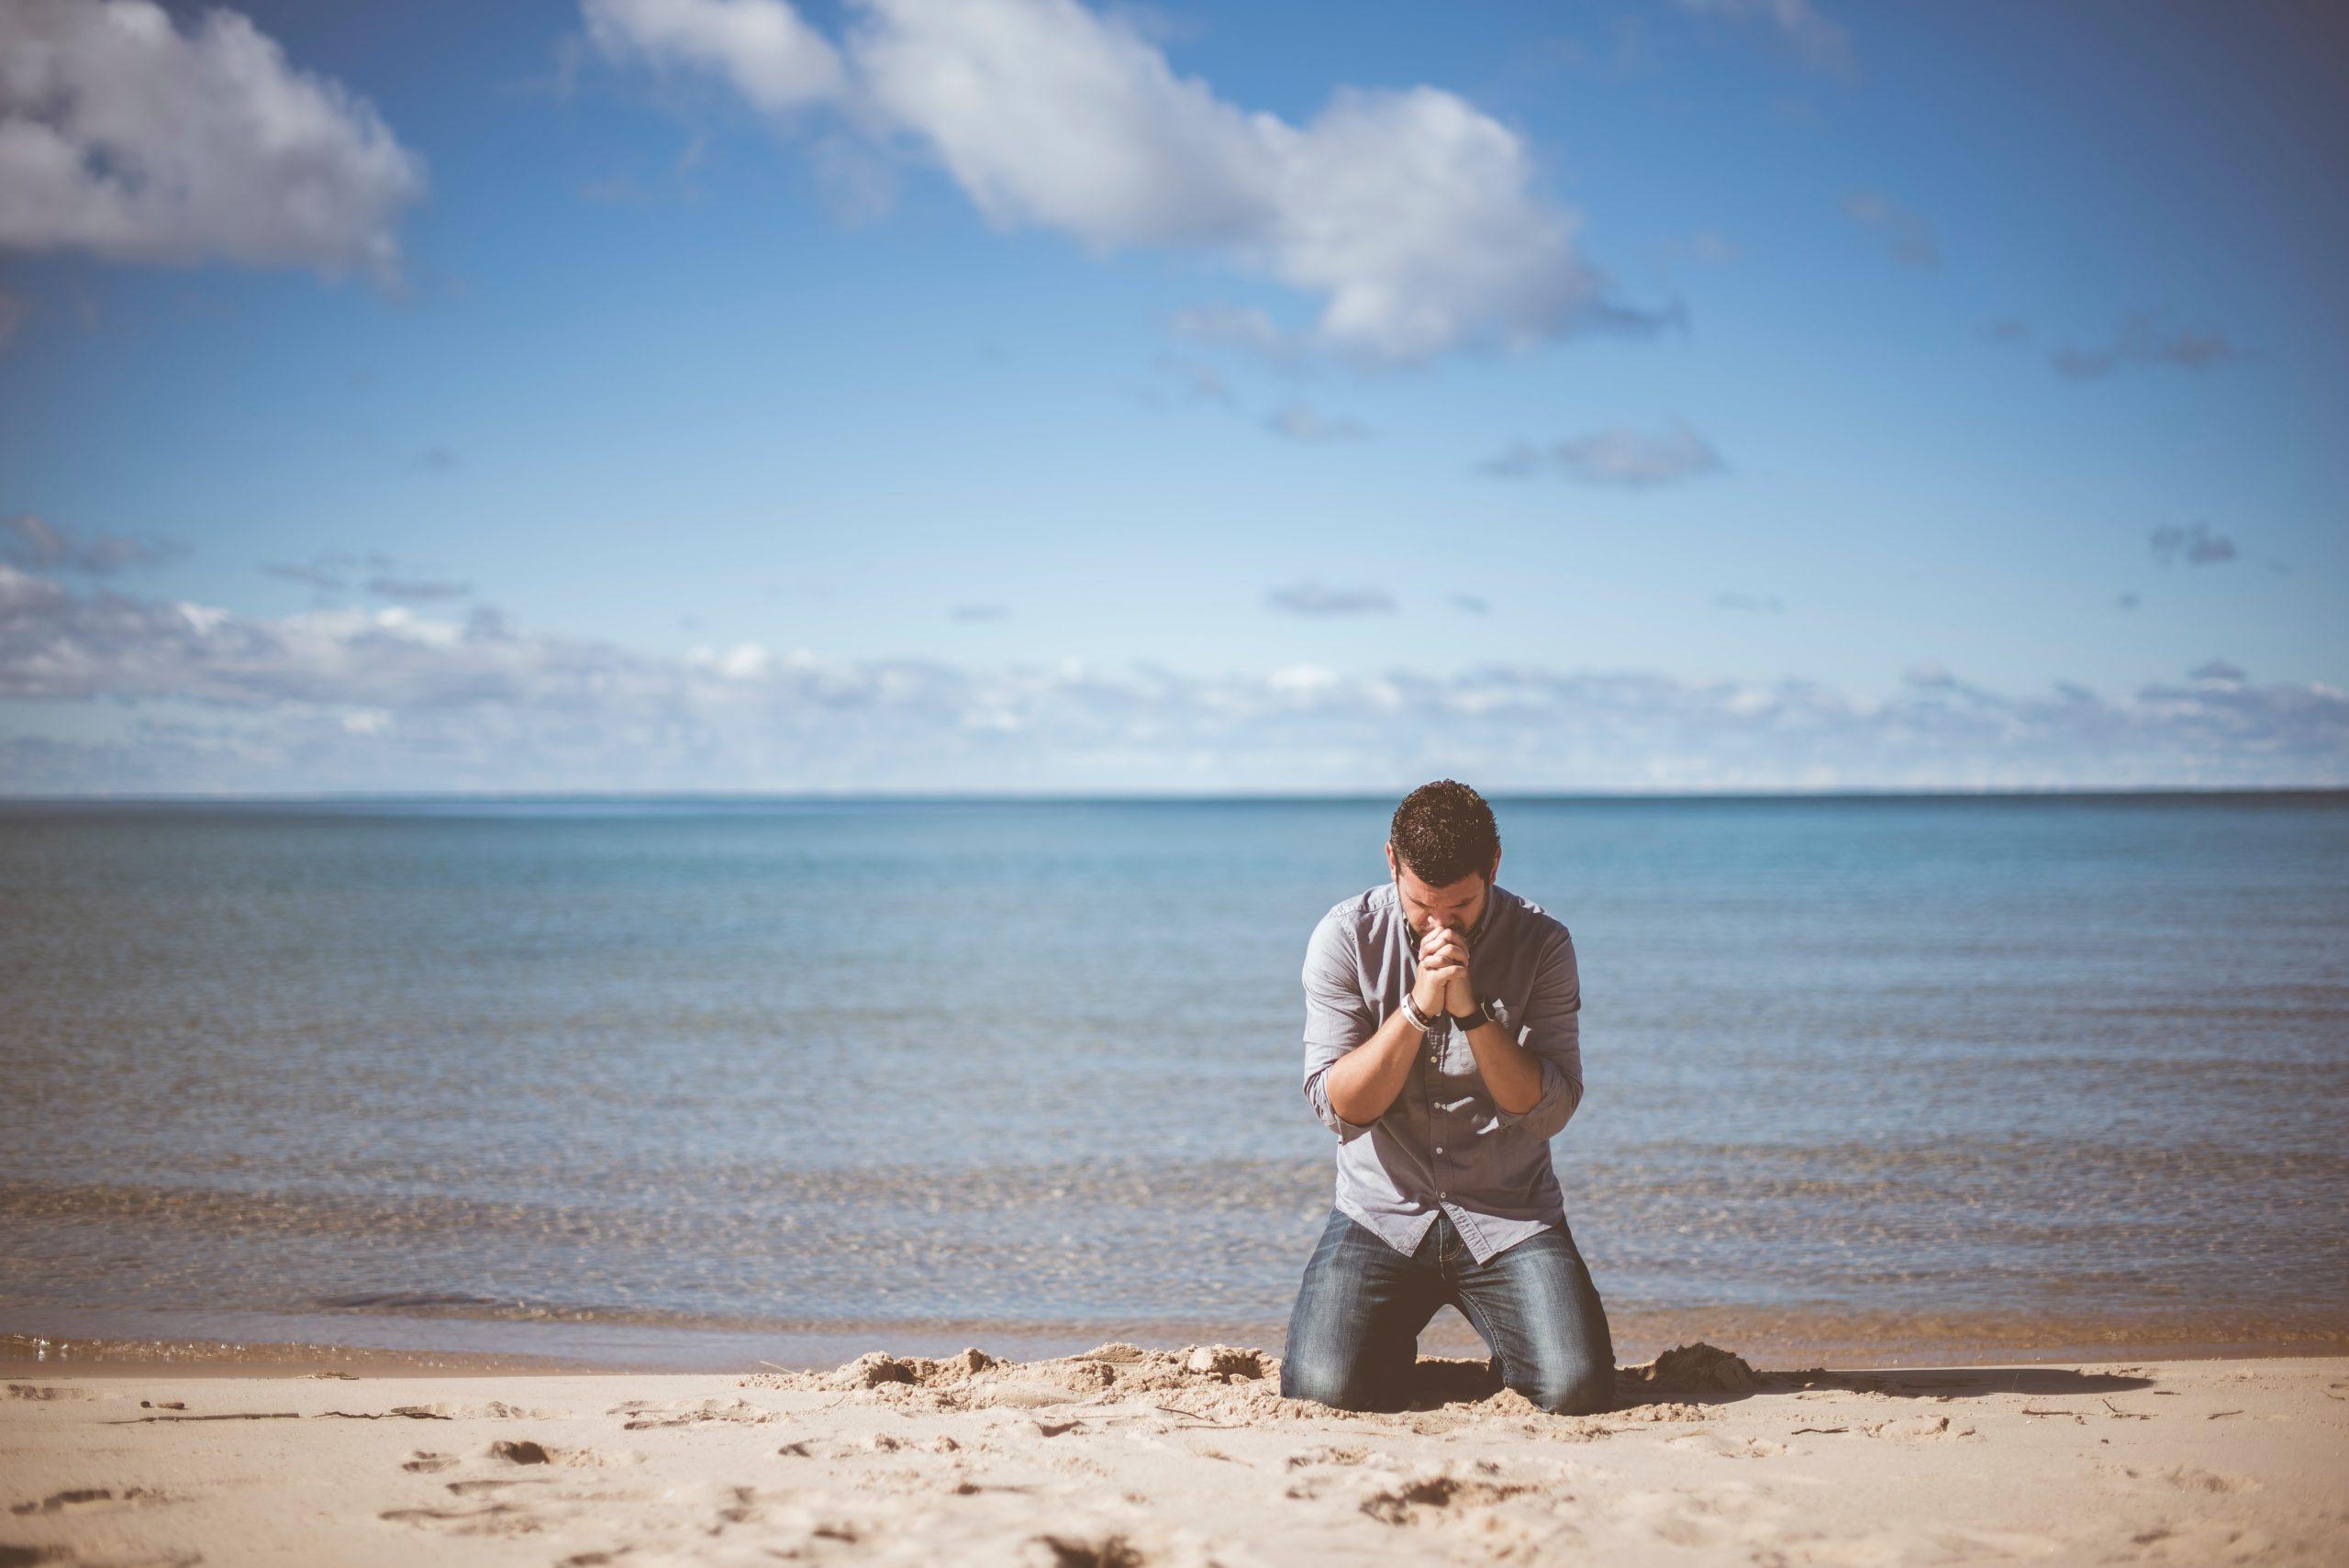 Man begging on the beach